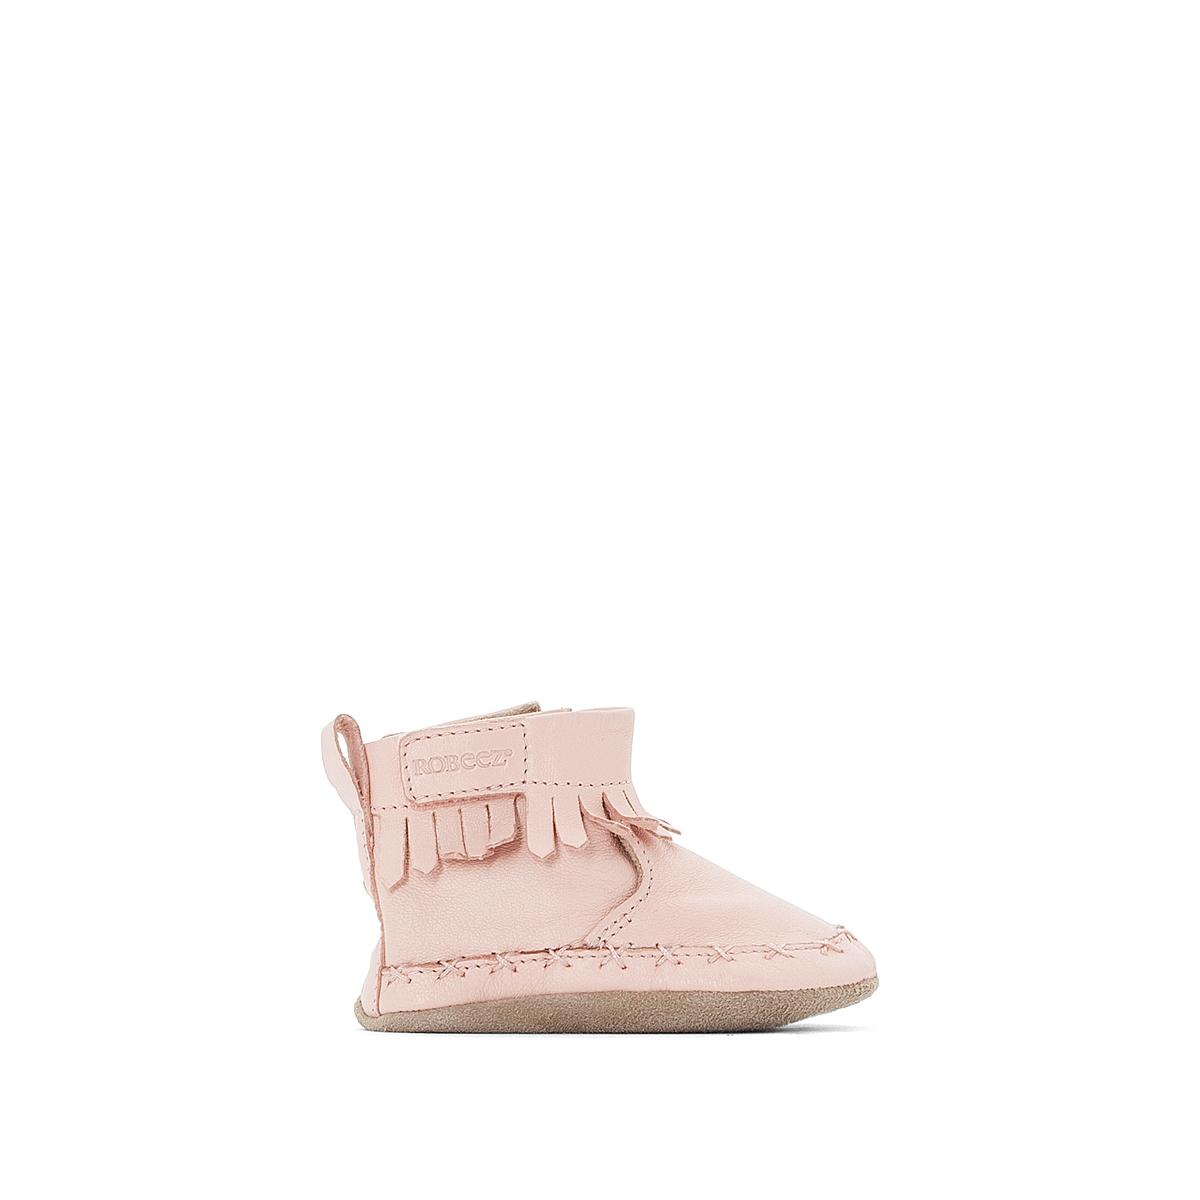 Туфли мягкие FUNKY SHOE bakkotie 2017 new spring fashion child casual baby leisure shoe kid brand girl princess shoe retro rhinestone hasp shallow pink